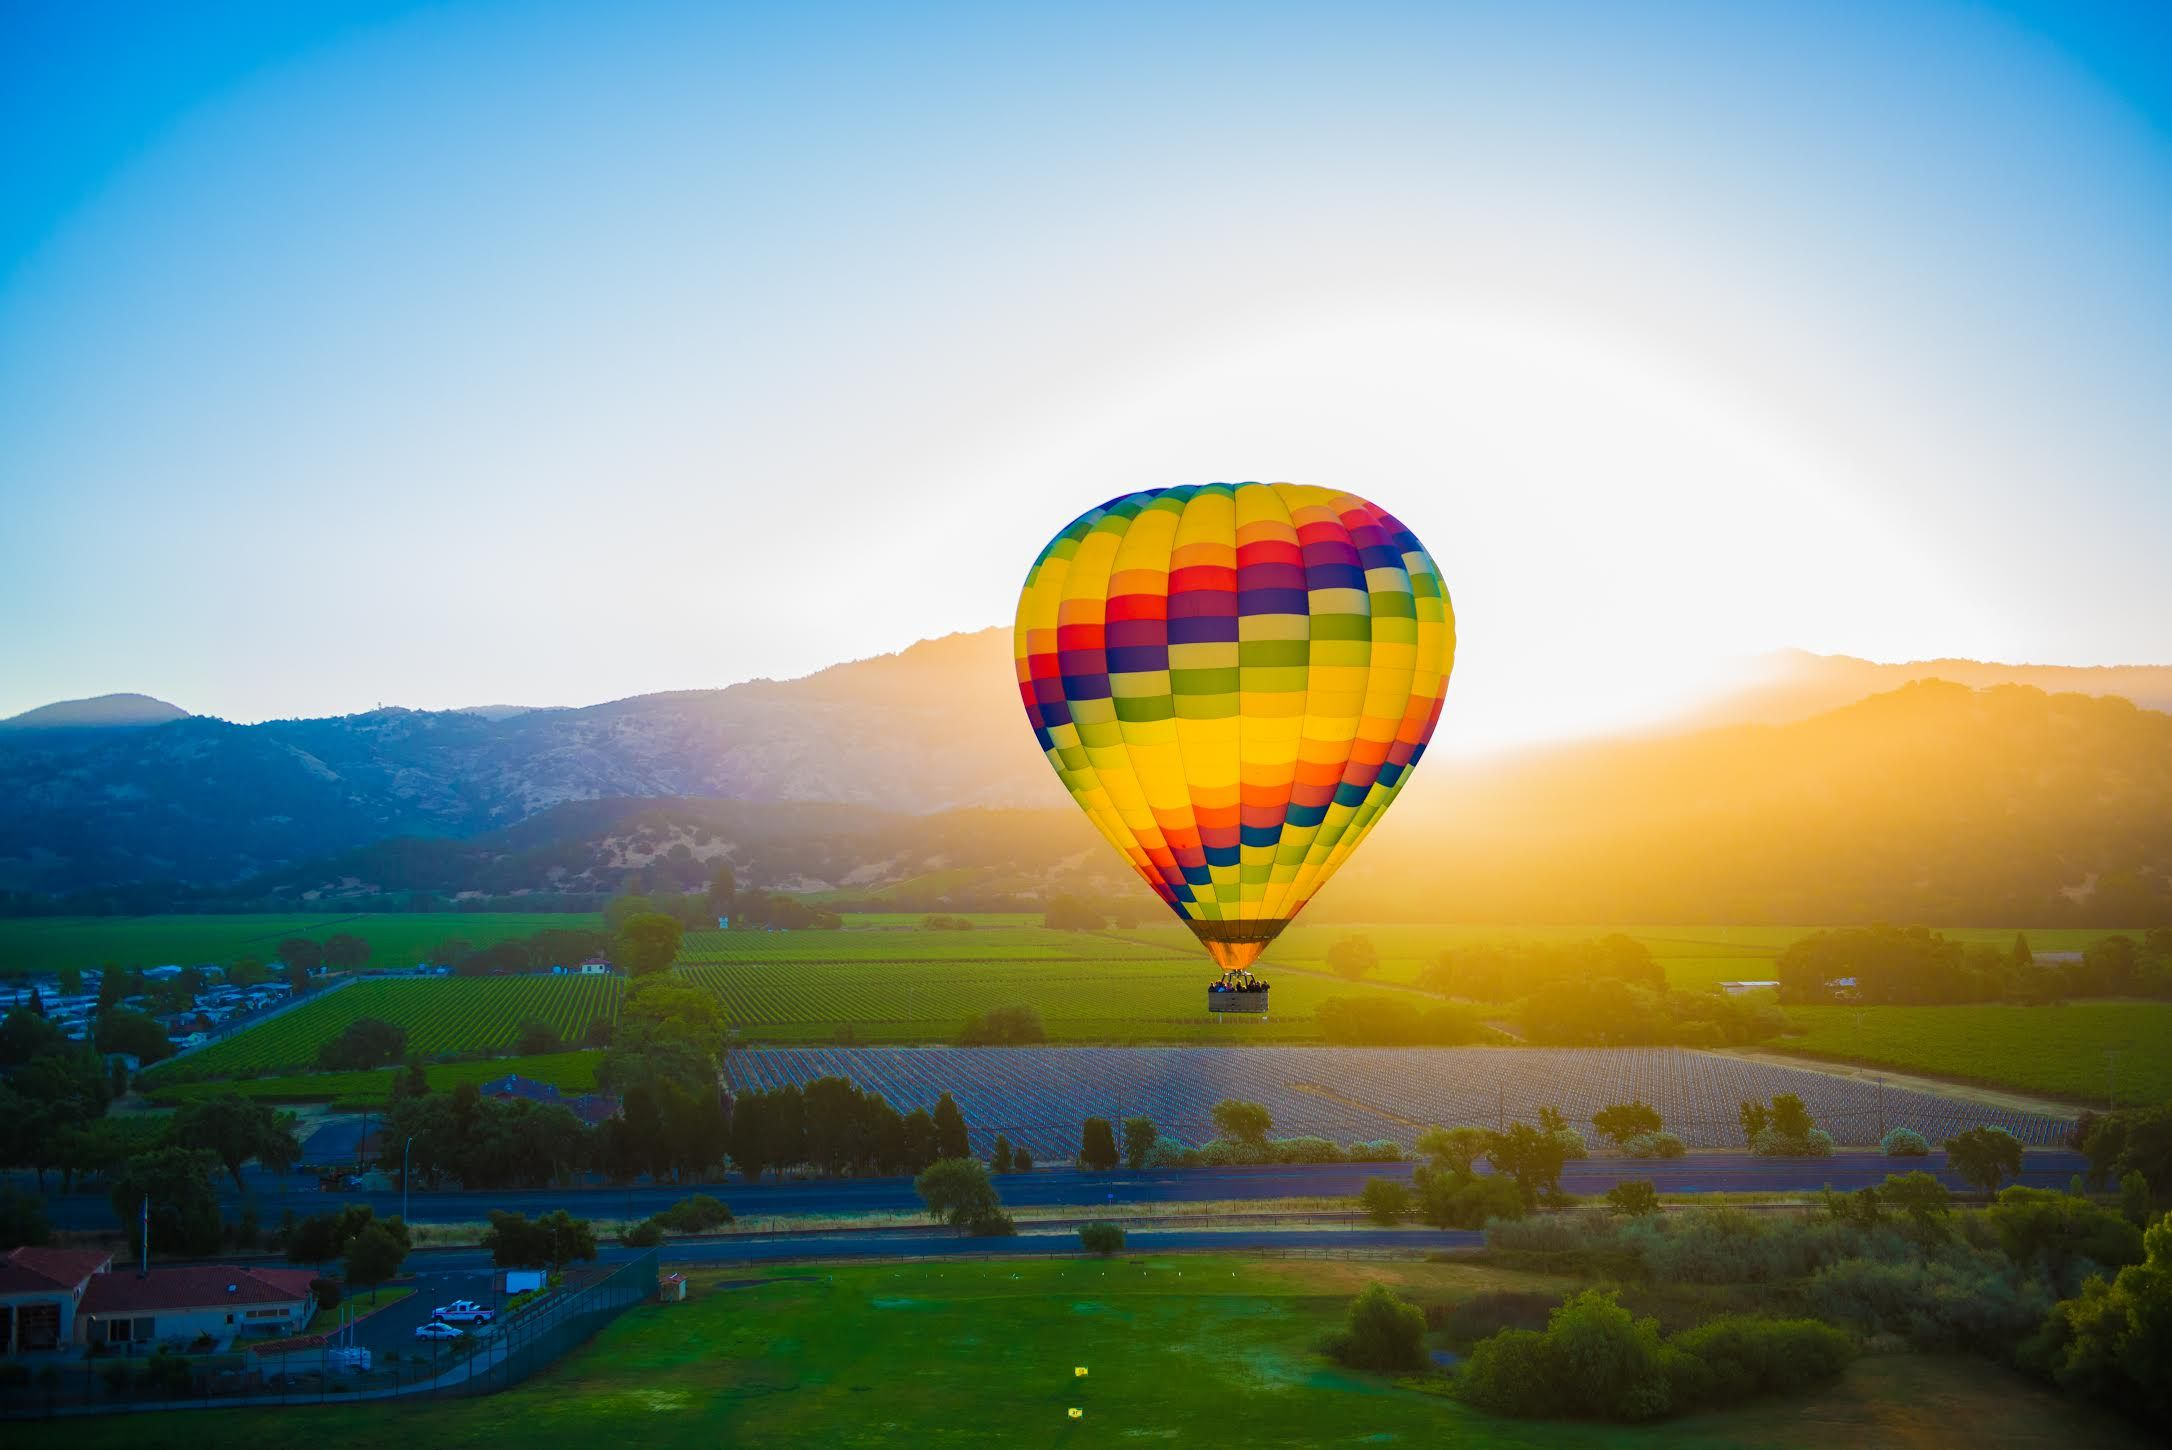 Napa Valley Balloons, Inc. Napa, CA 94558 Napa trip